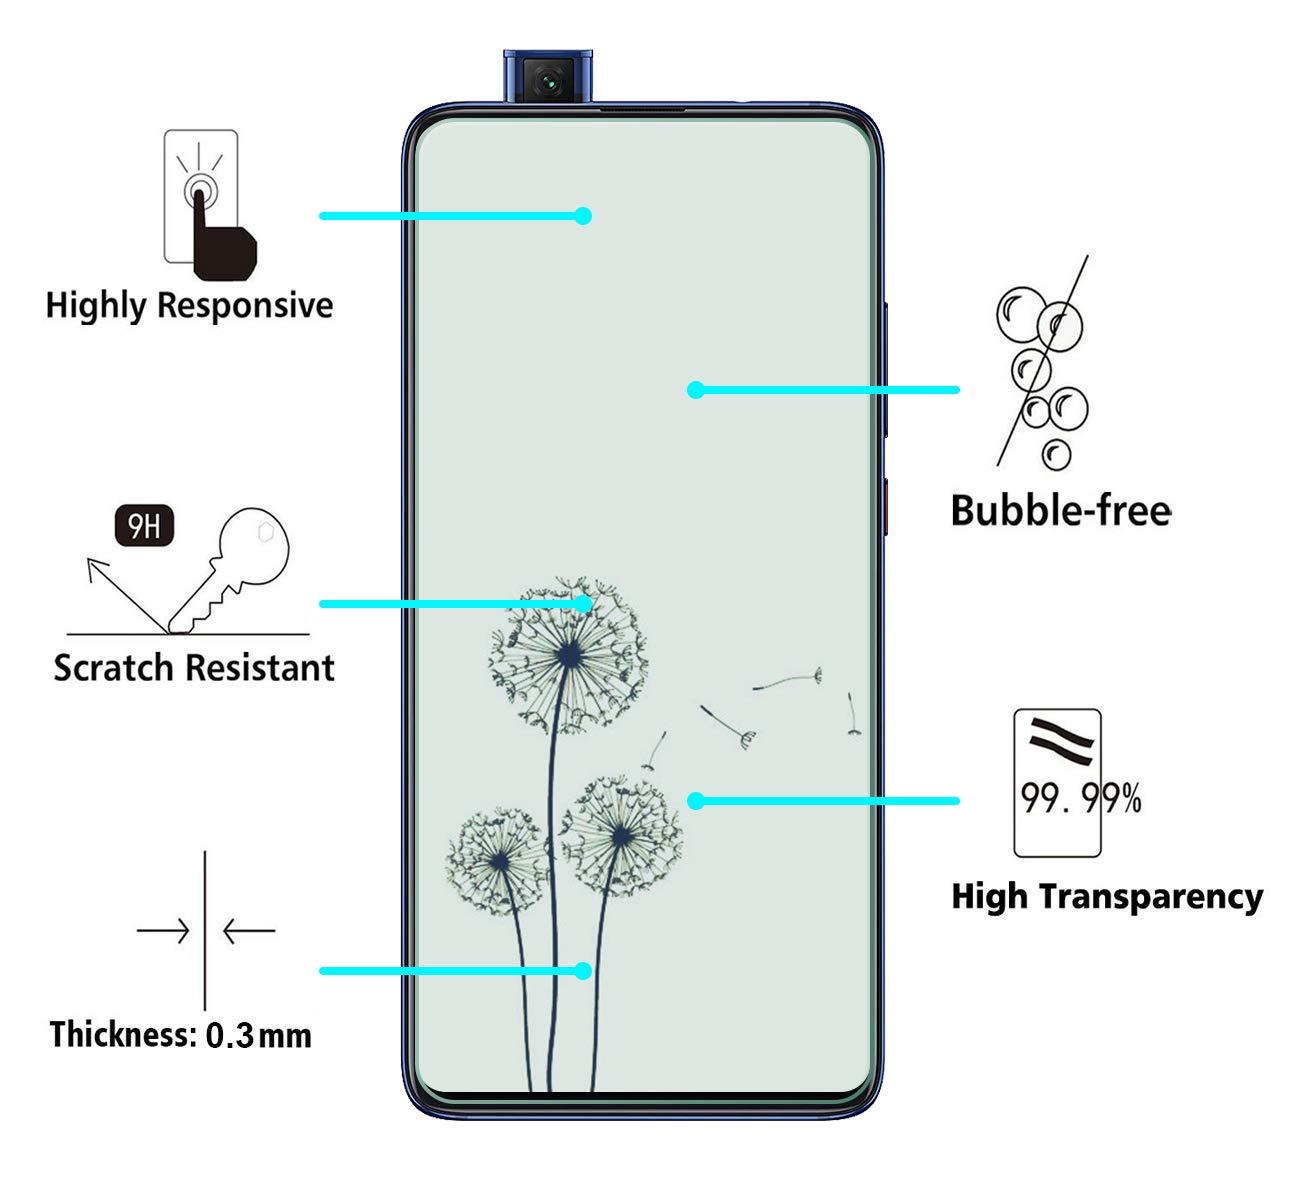 Cafwly 3 Unidades Protector de Pantalla para Xiaomi Mi 9T //Xiaomi Mi 9T Pro,Cristal Templado para Xiaomi Mi 9T //Xiaomi Mi 9T Pro Fcil de Instalacin Ara/ñazos Resistente Alta Definicion